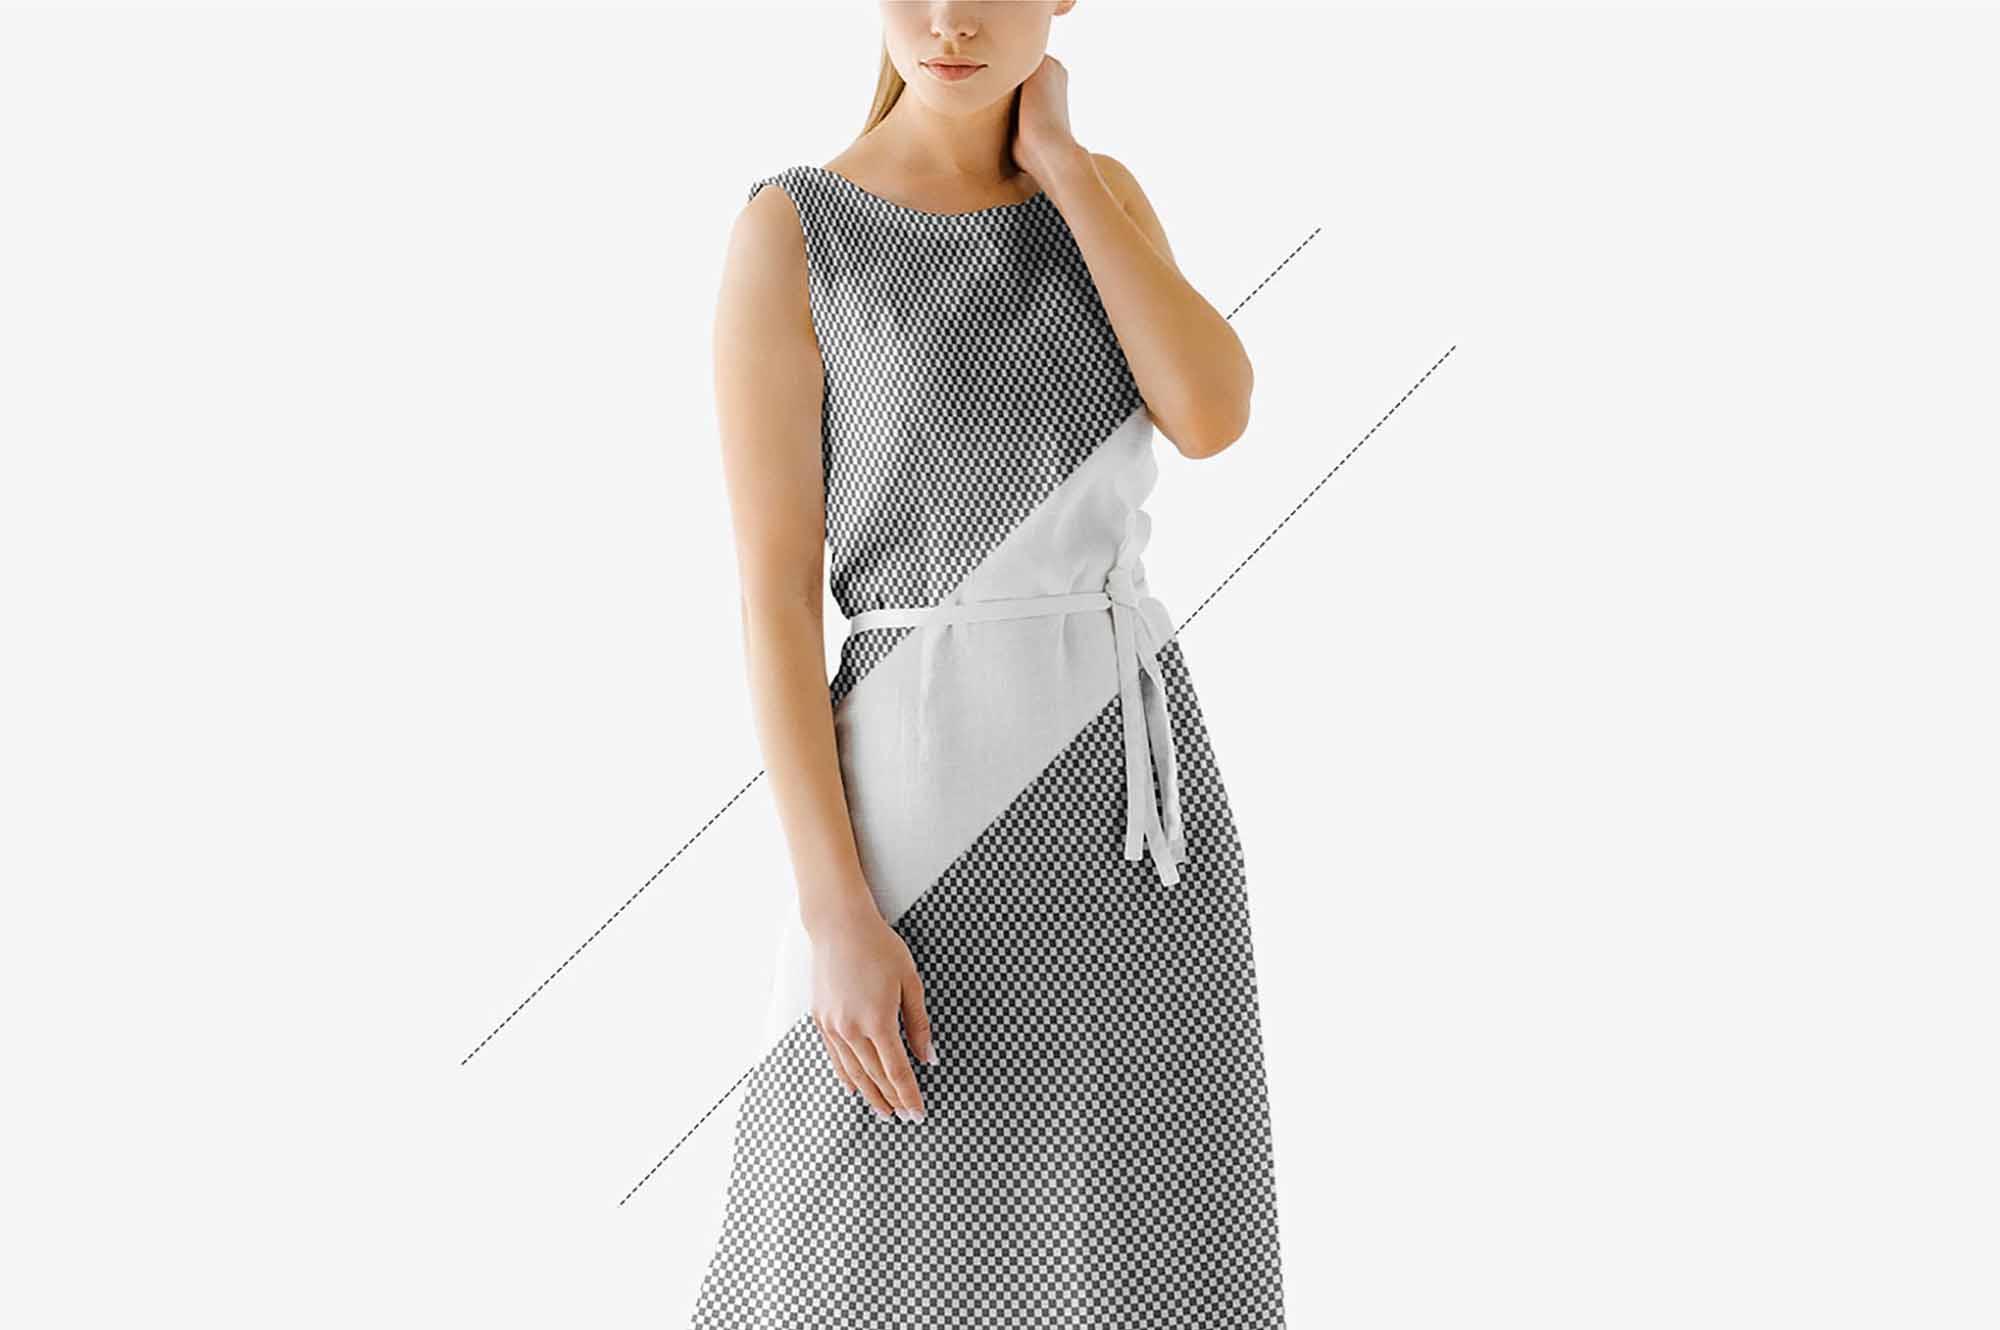 Summer Dress Mockup 2